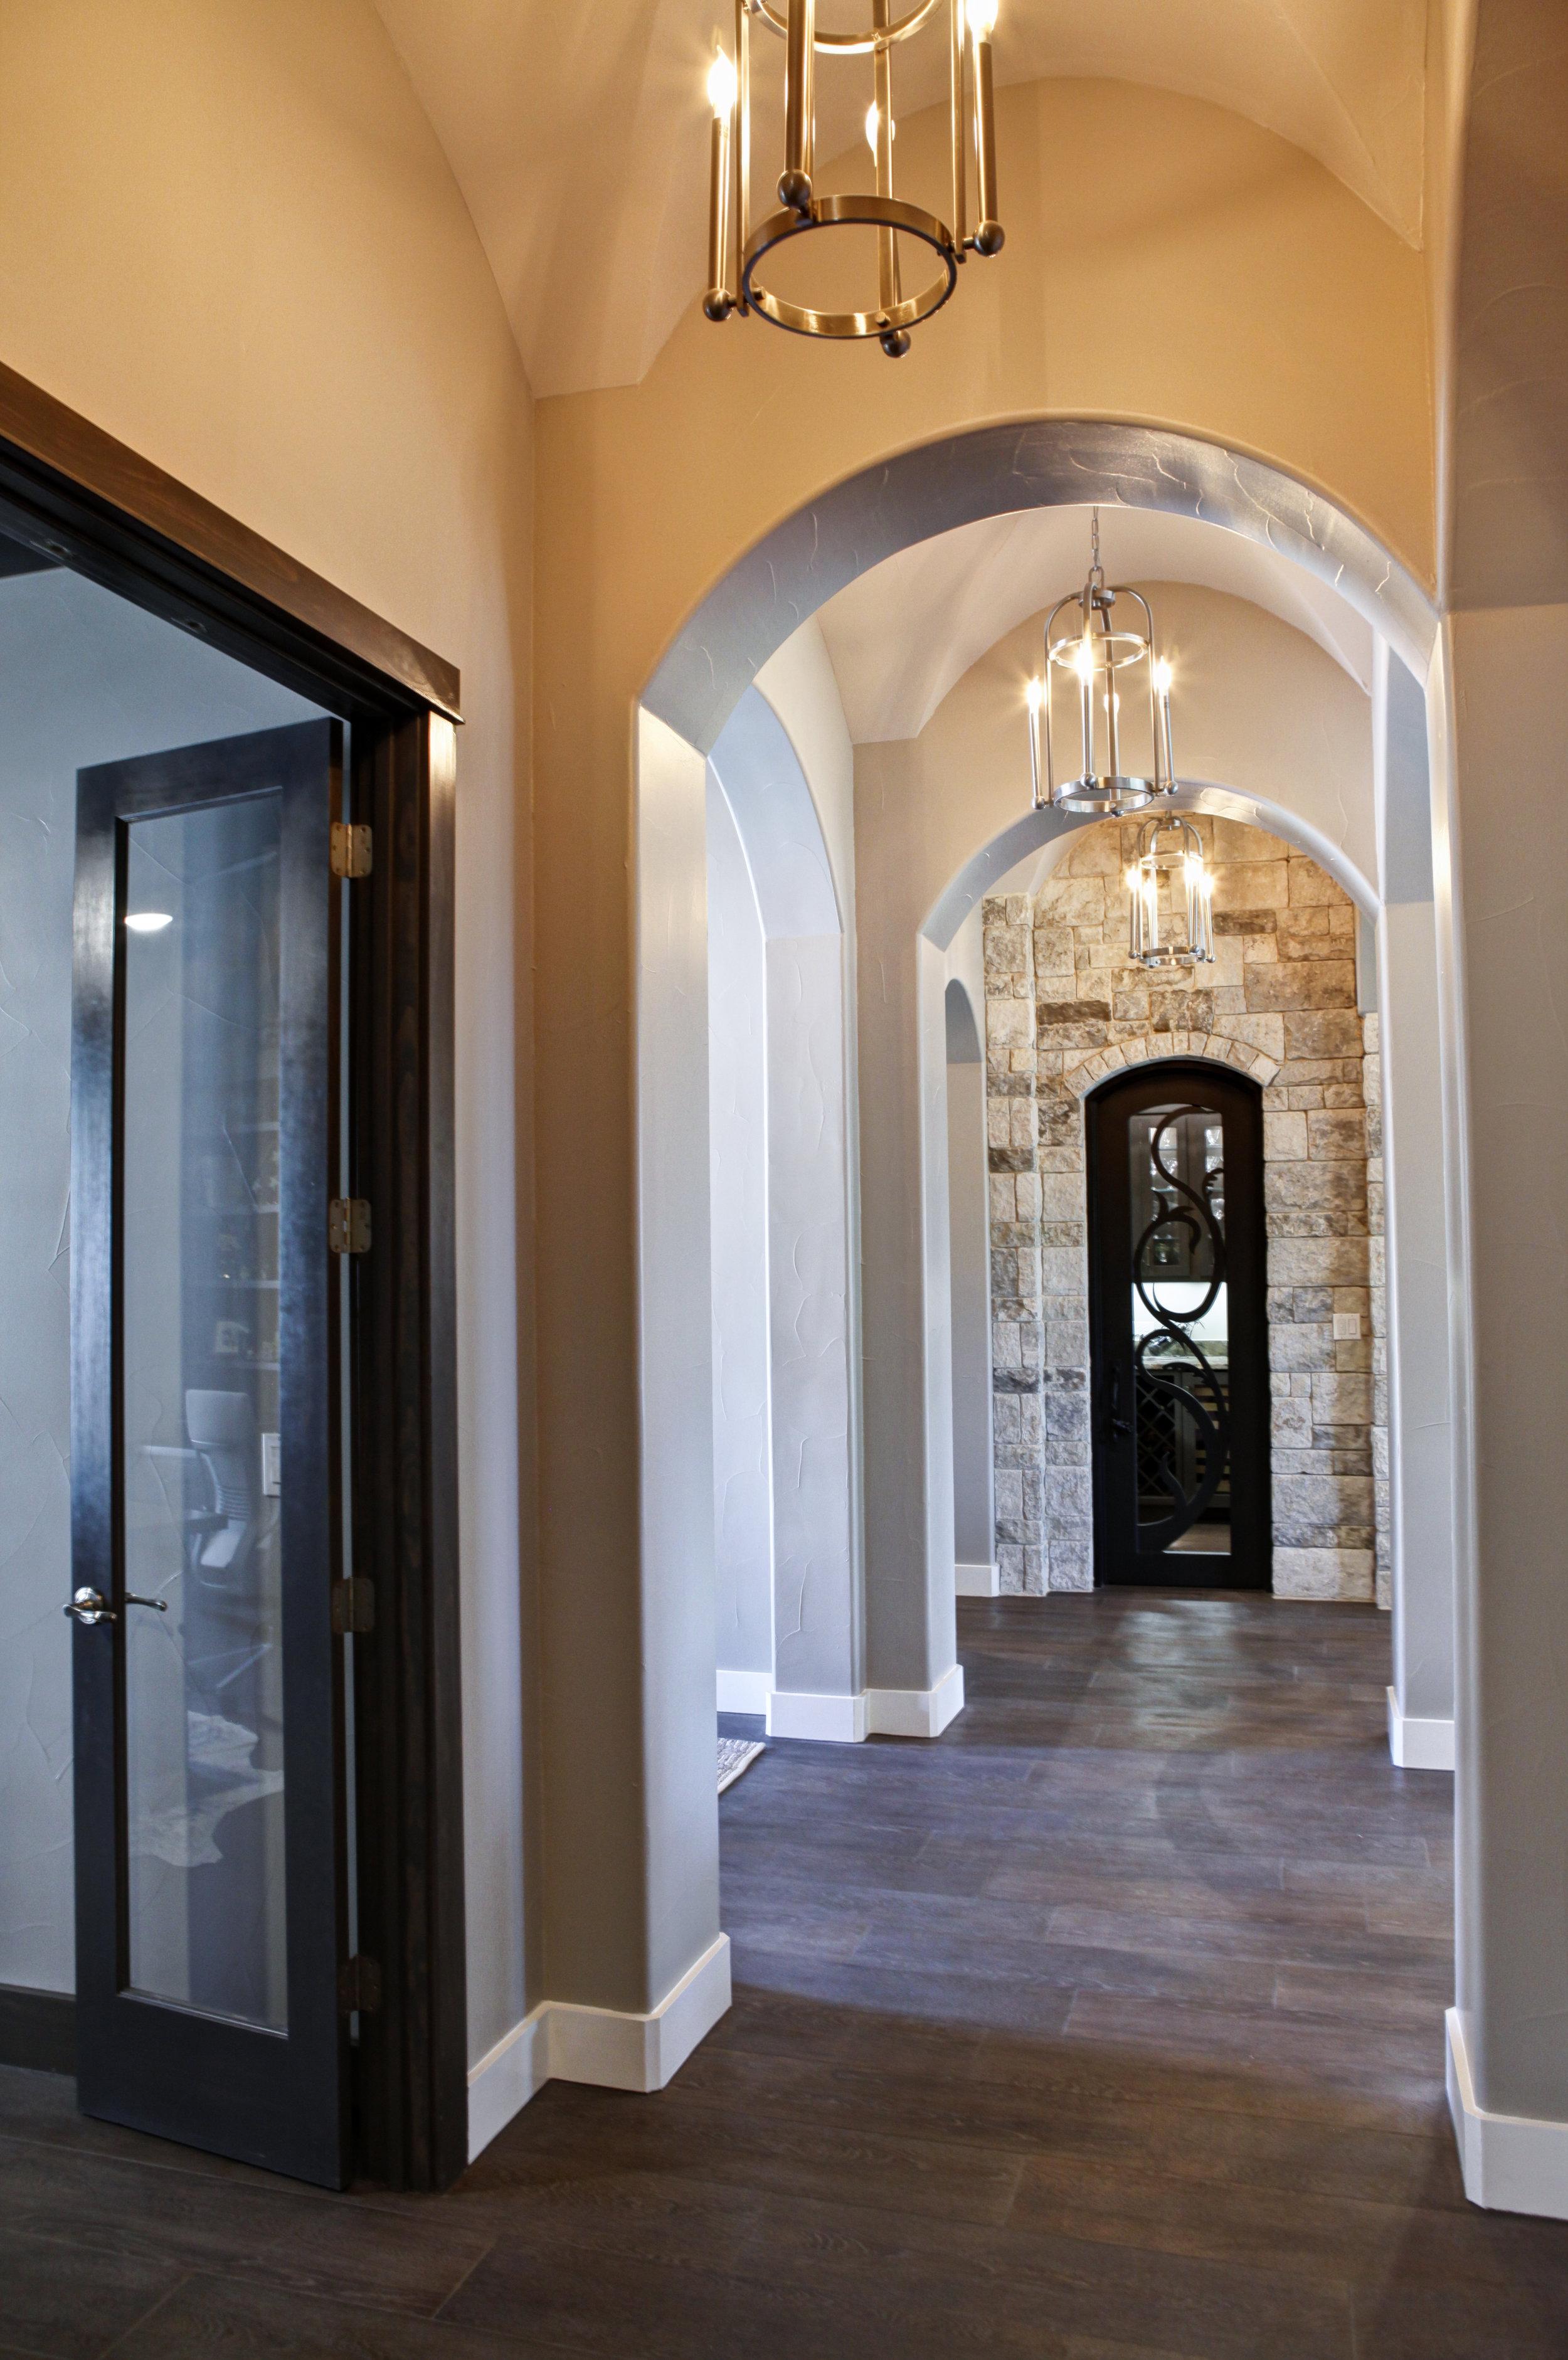 7-hallway arches - 1.jpg